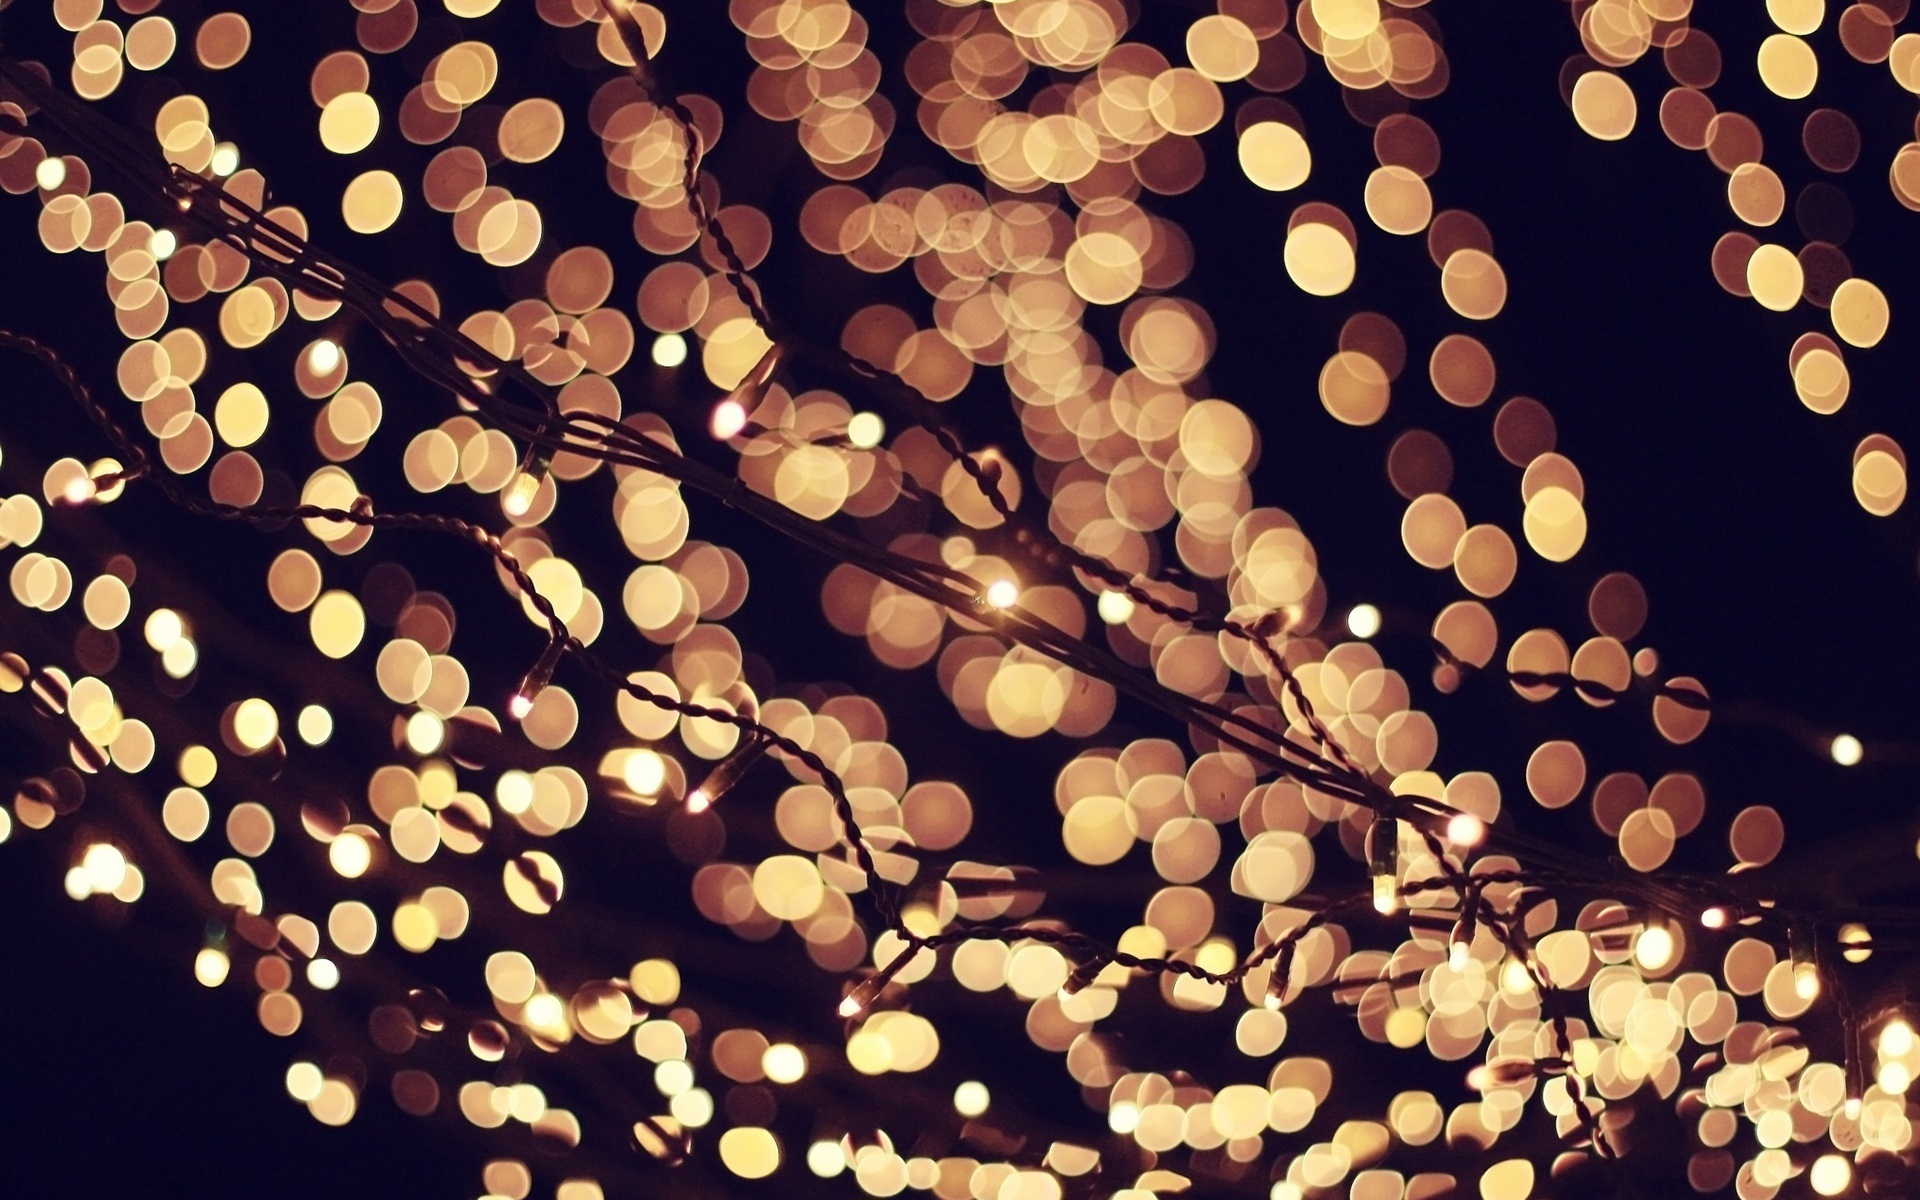 Lights Bokeh Evening Night Holidays 640x1136 Iphone 5 5s